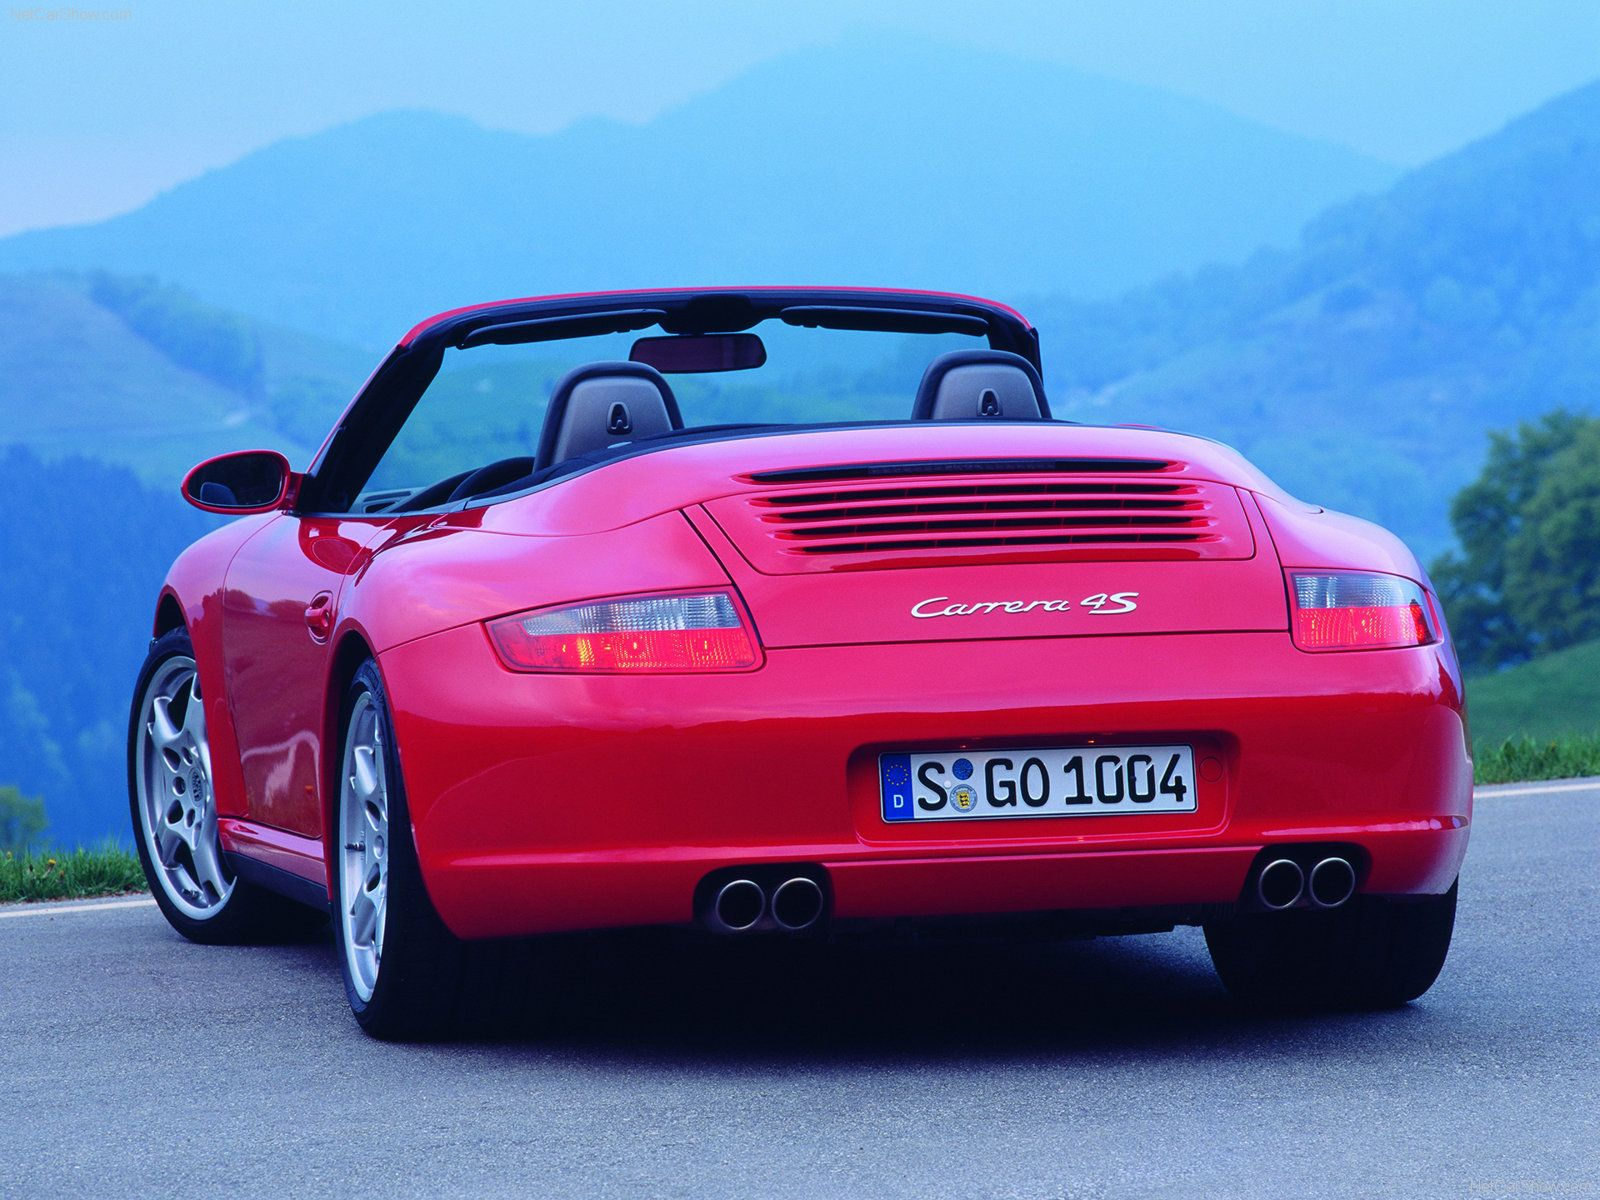 Pin By Lee Suyang On Cars Porsche 911 Carrera 4s Porsche 911 2006 Porsche 911